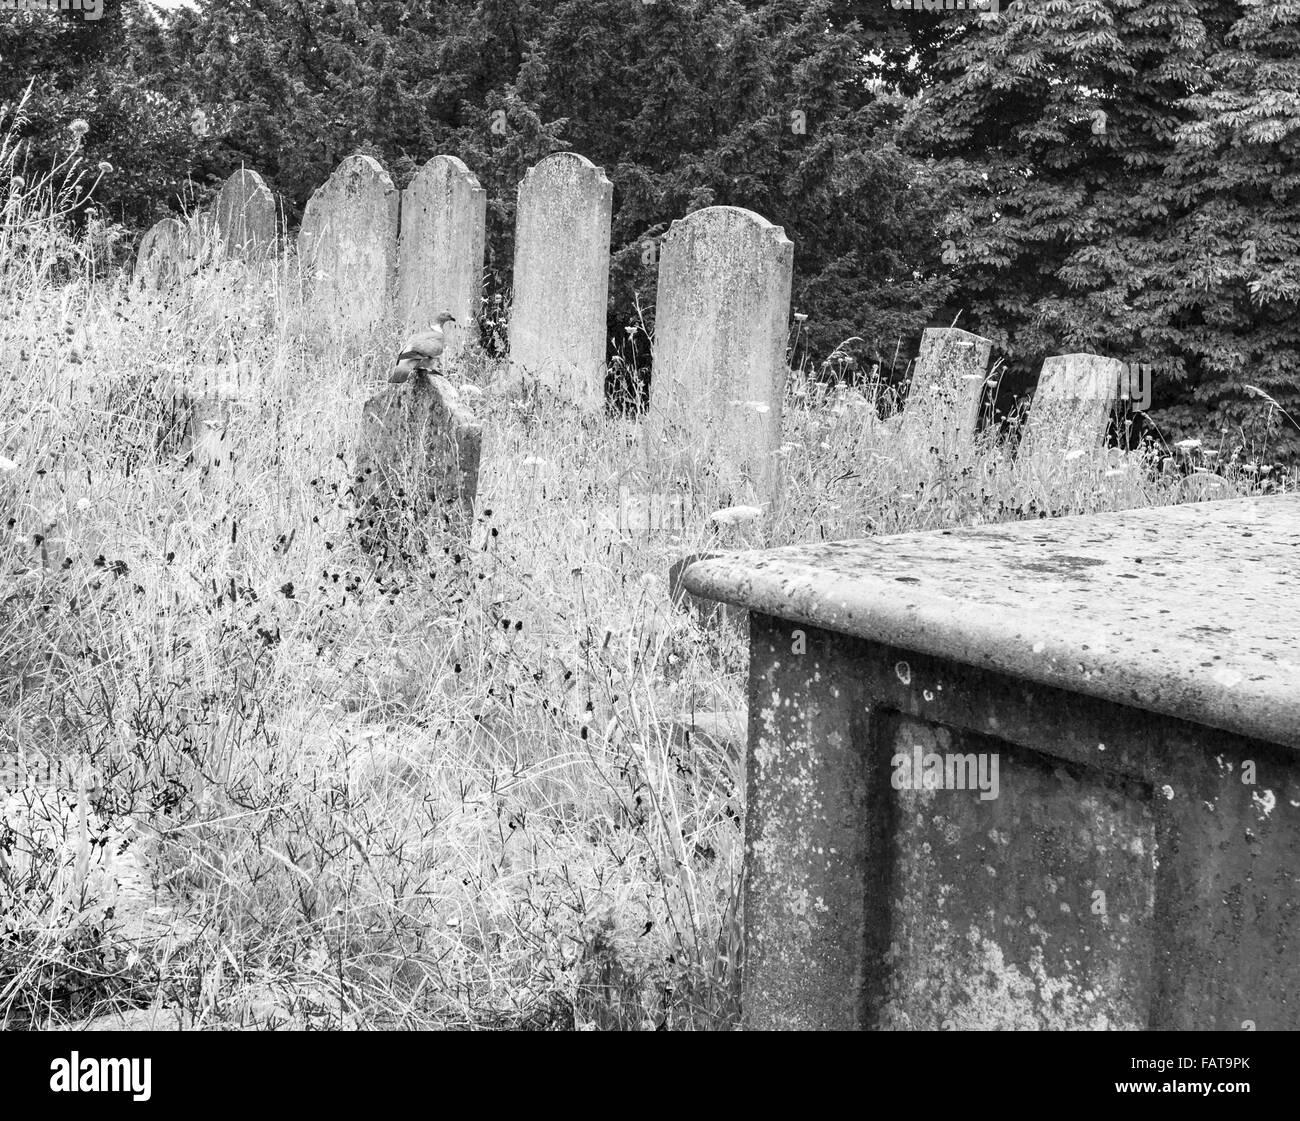 Graveyard pigeon. - Stock Image